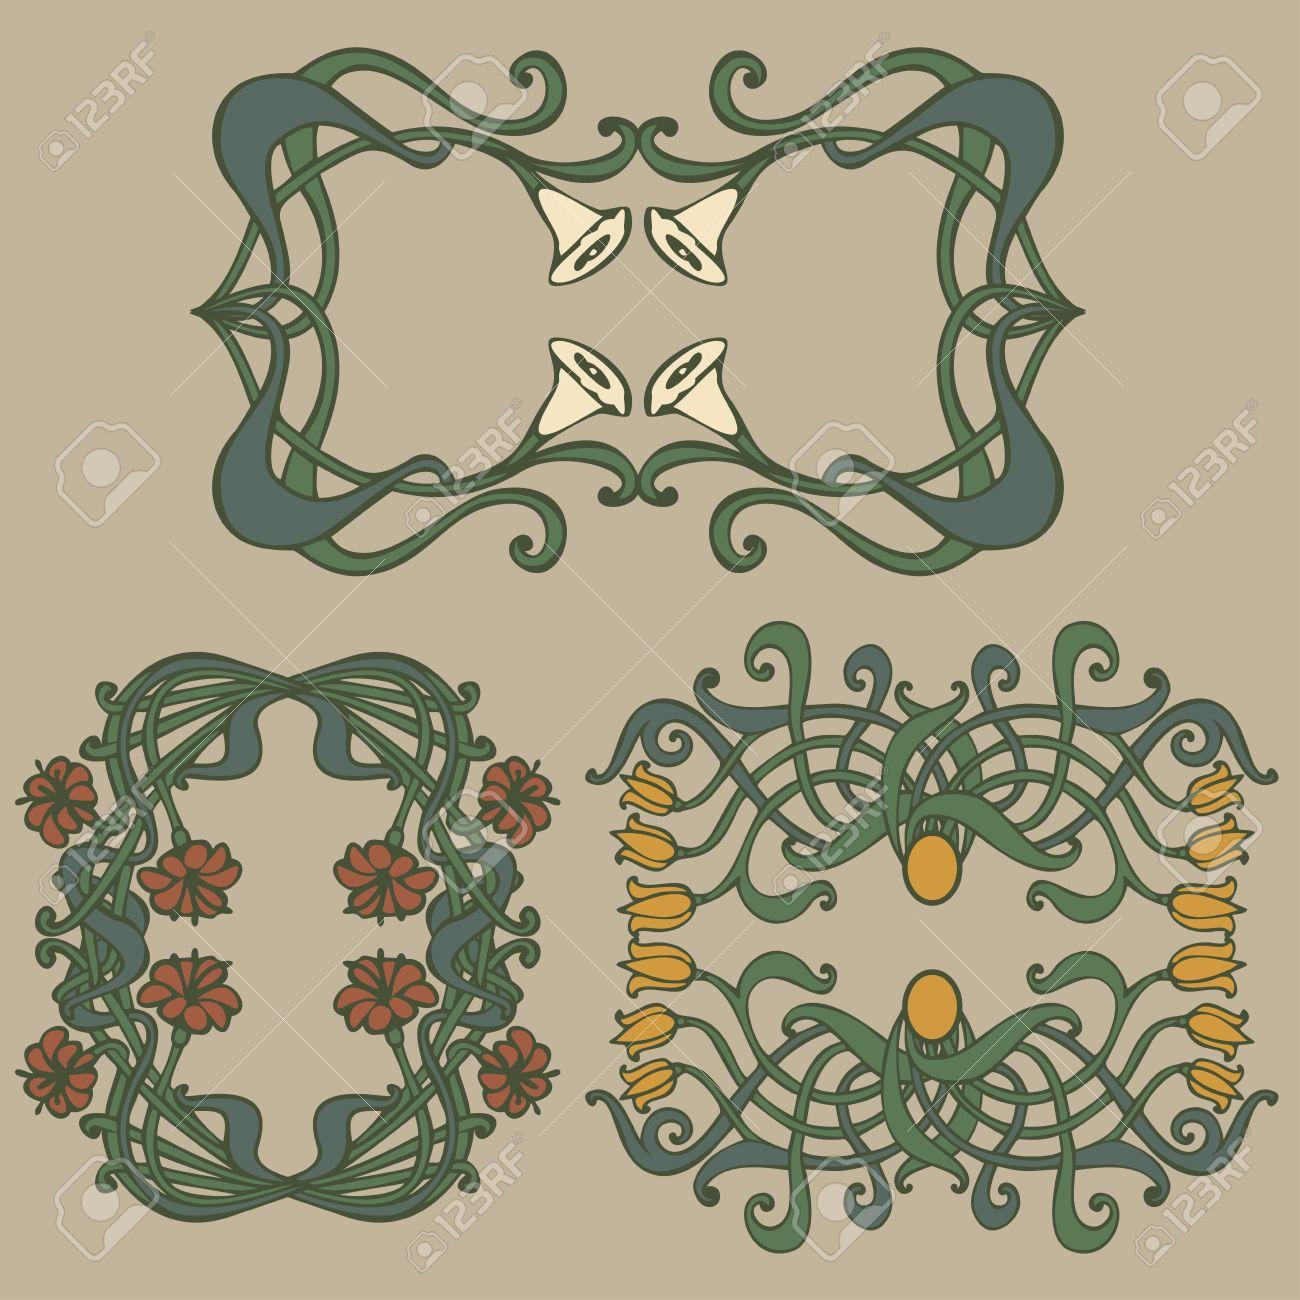 Art deco ornaments - Art Nouveau And Art Deco Floral Ornaments Modern And Jugendstil Vintage Elements Stock Vector